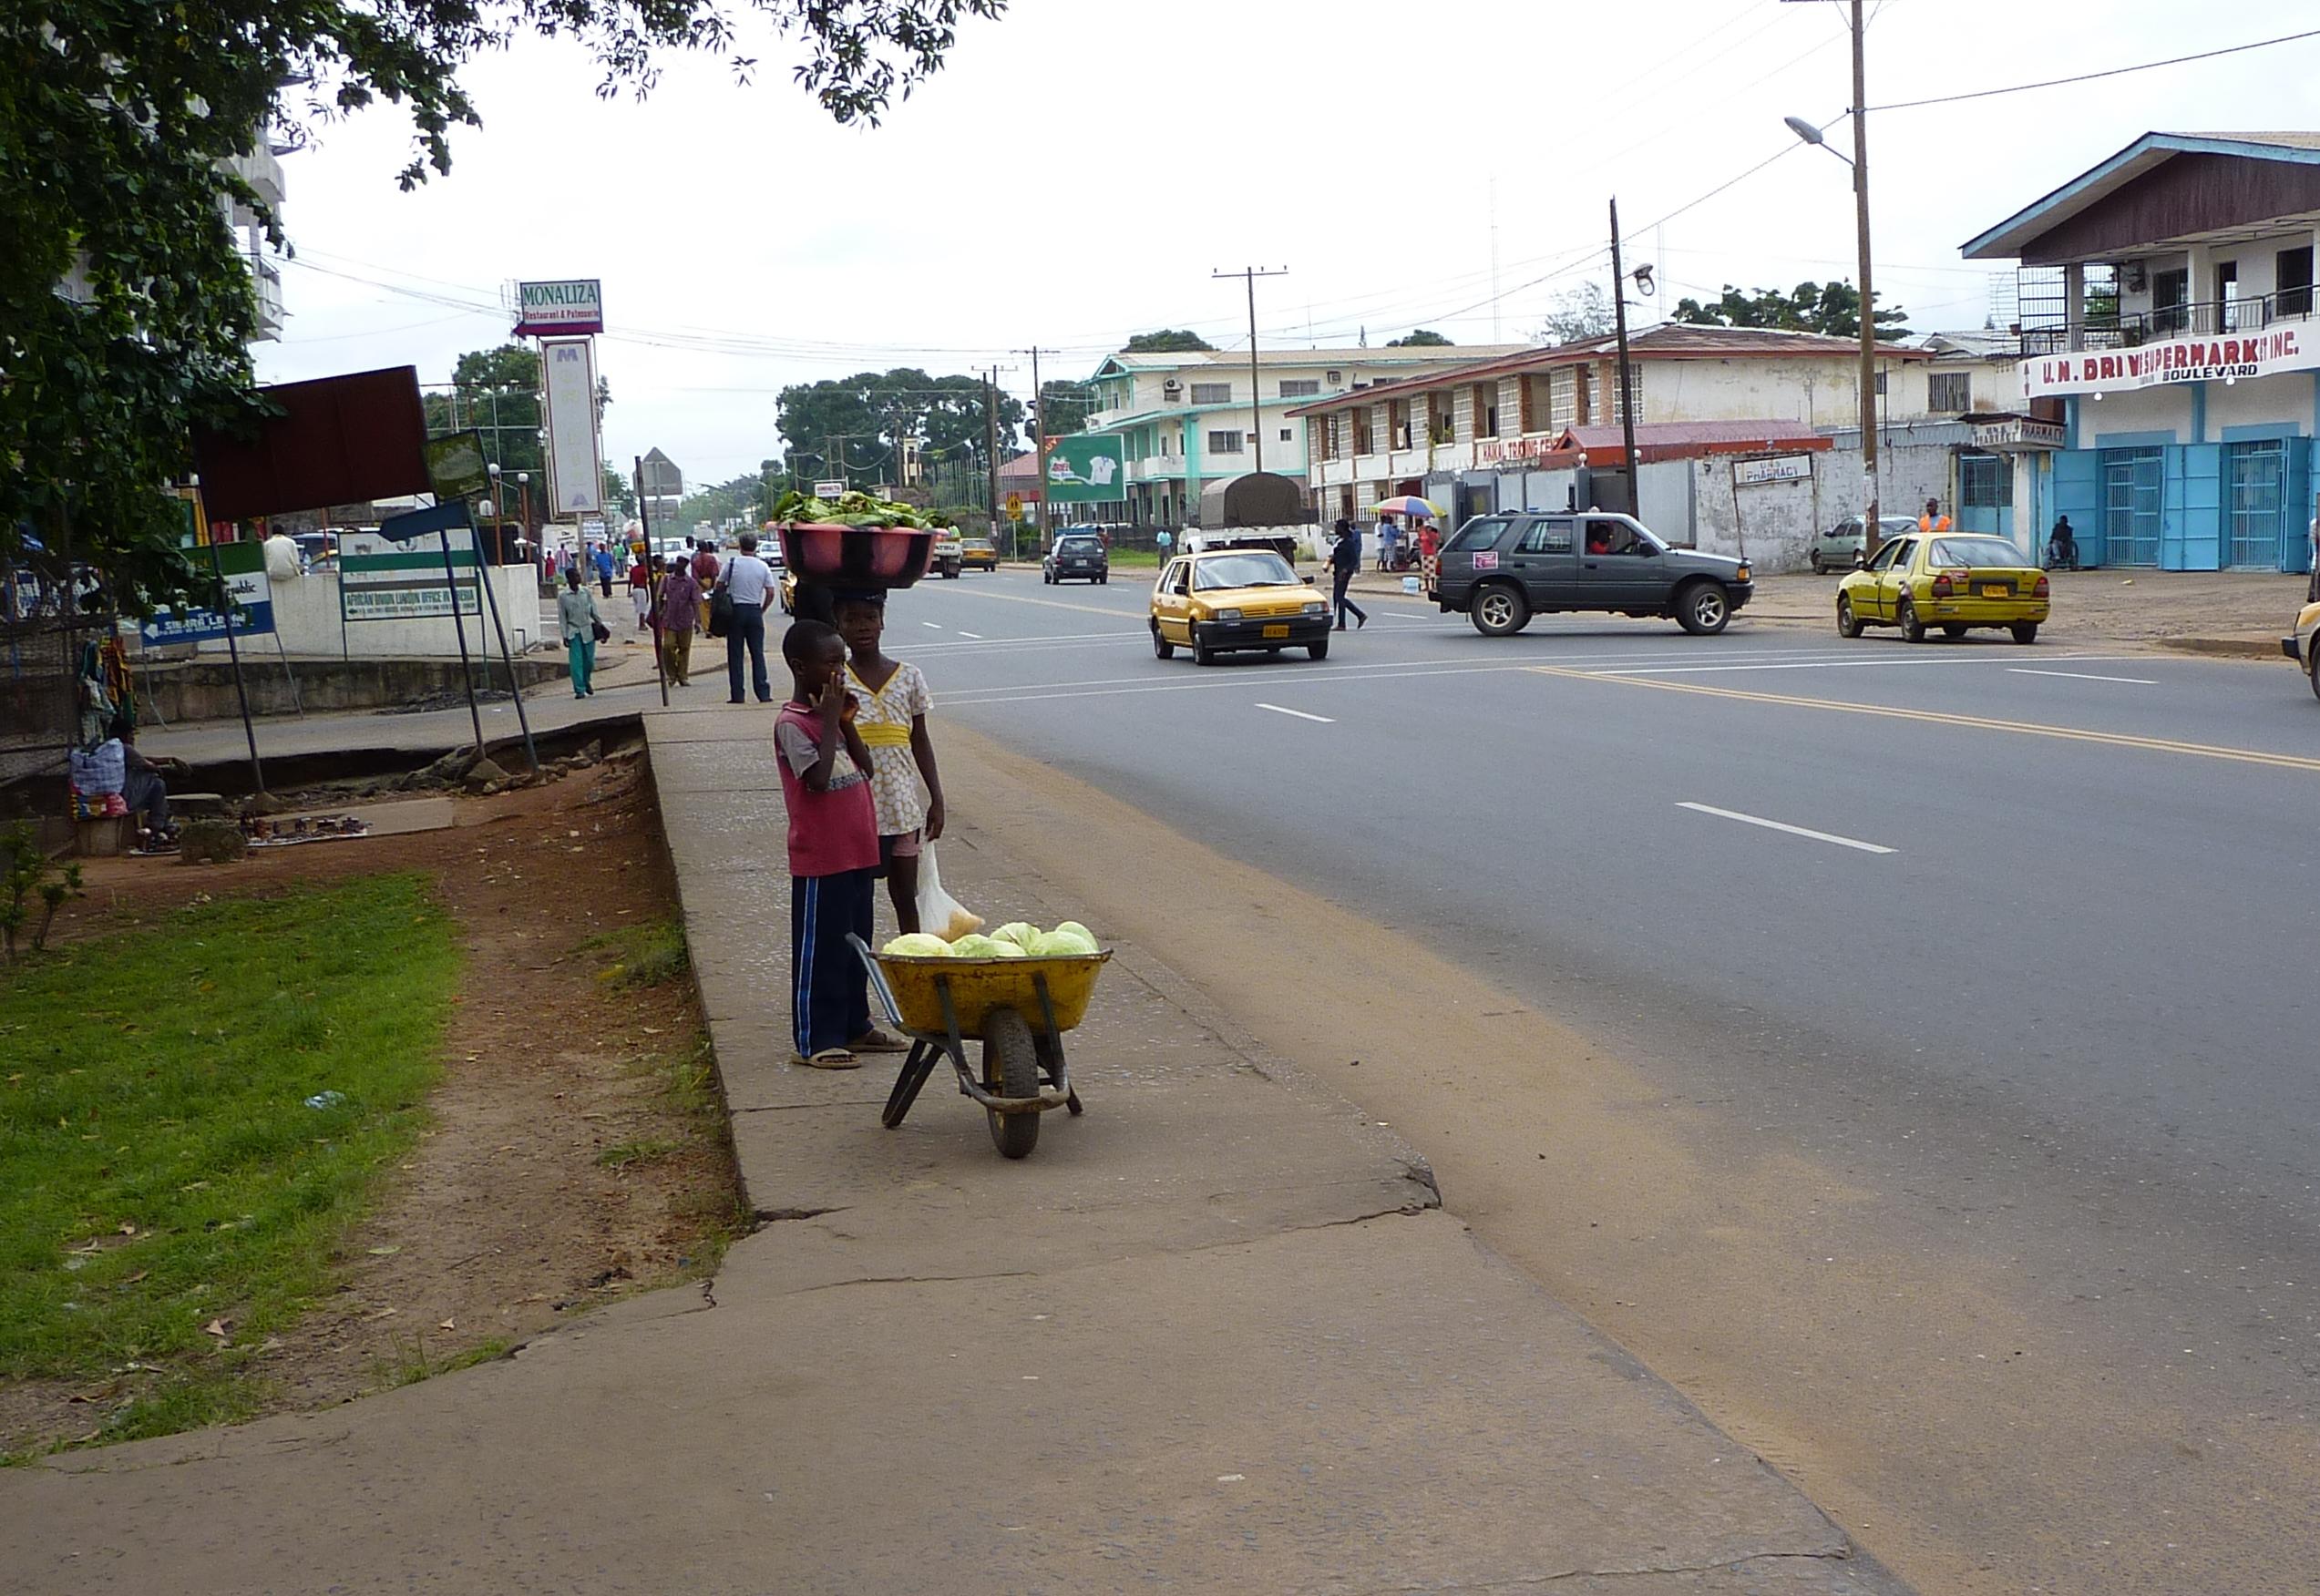 Liberian Boy and Girl Selling Lettuce